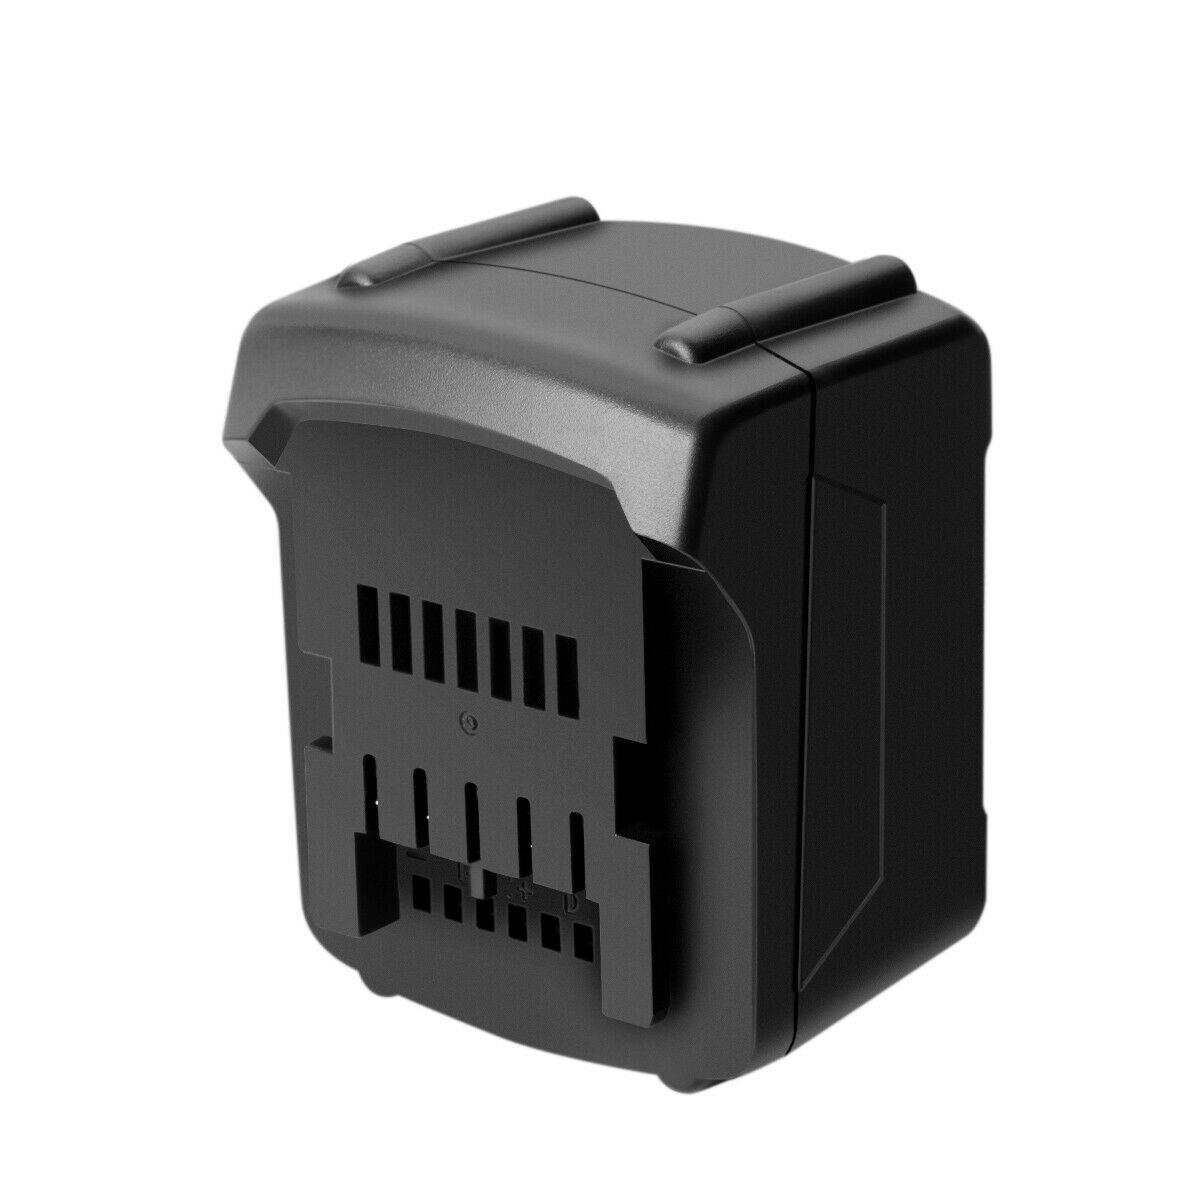 Batterie 14.4V 3000mAh Li-Ion Metabo BS 144 LTX impulse 60214350 60214361(compatible)